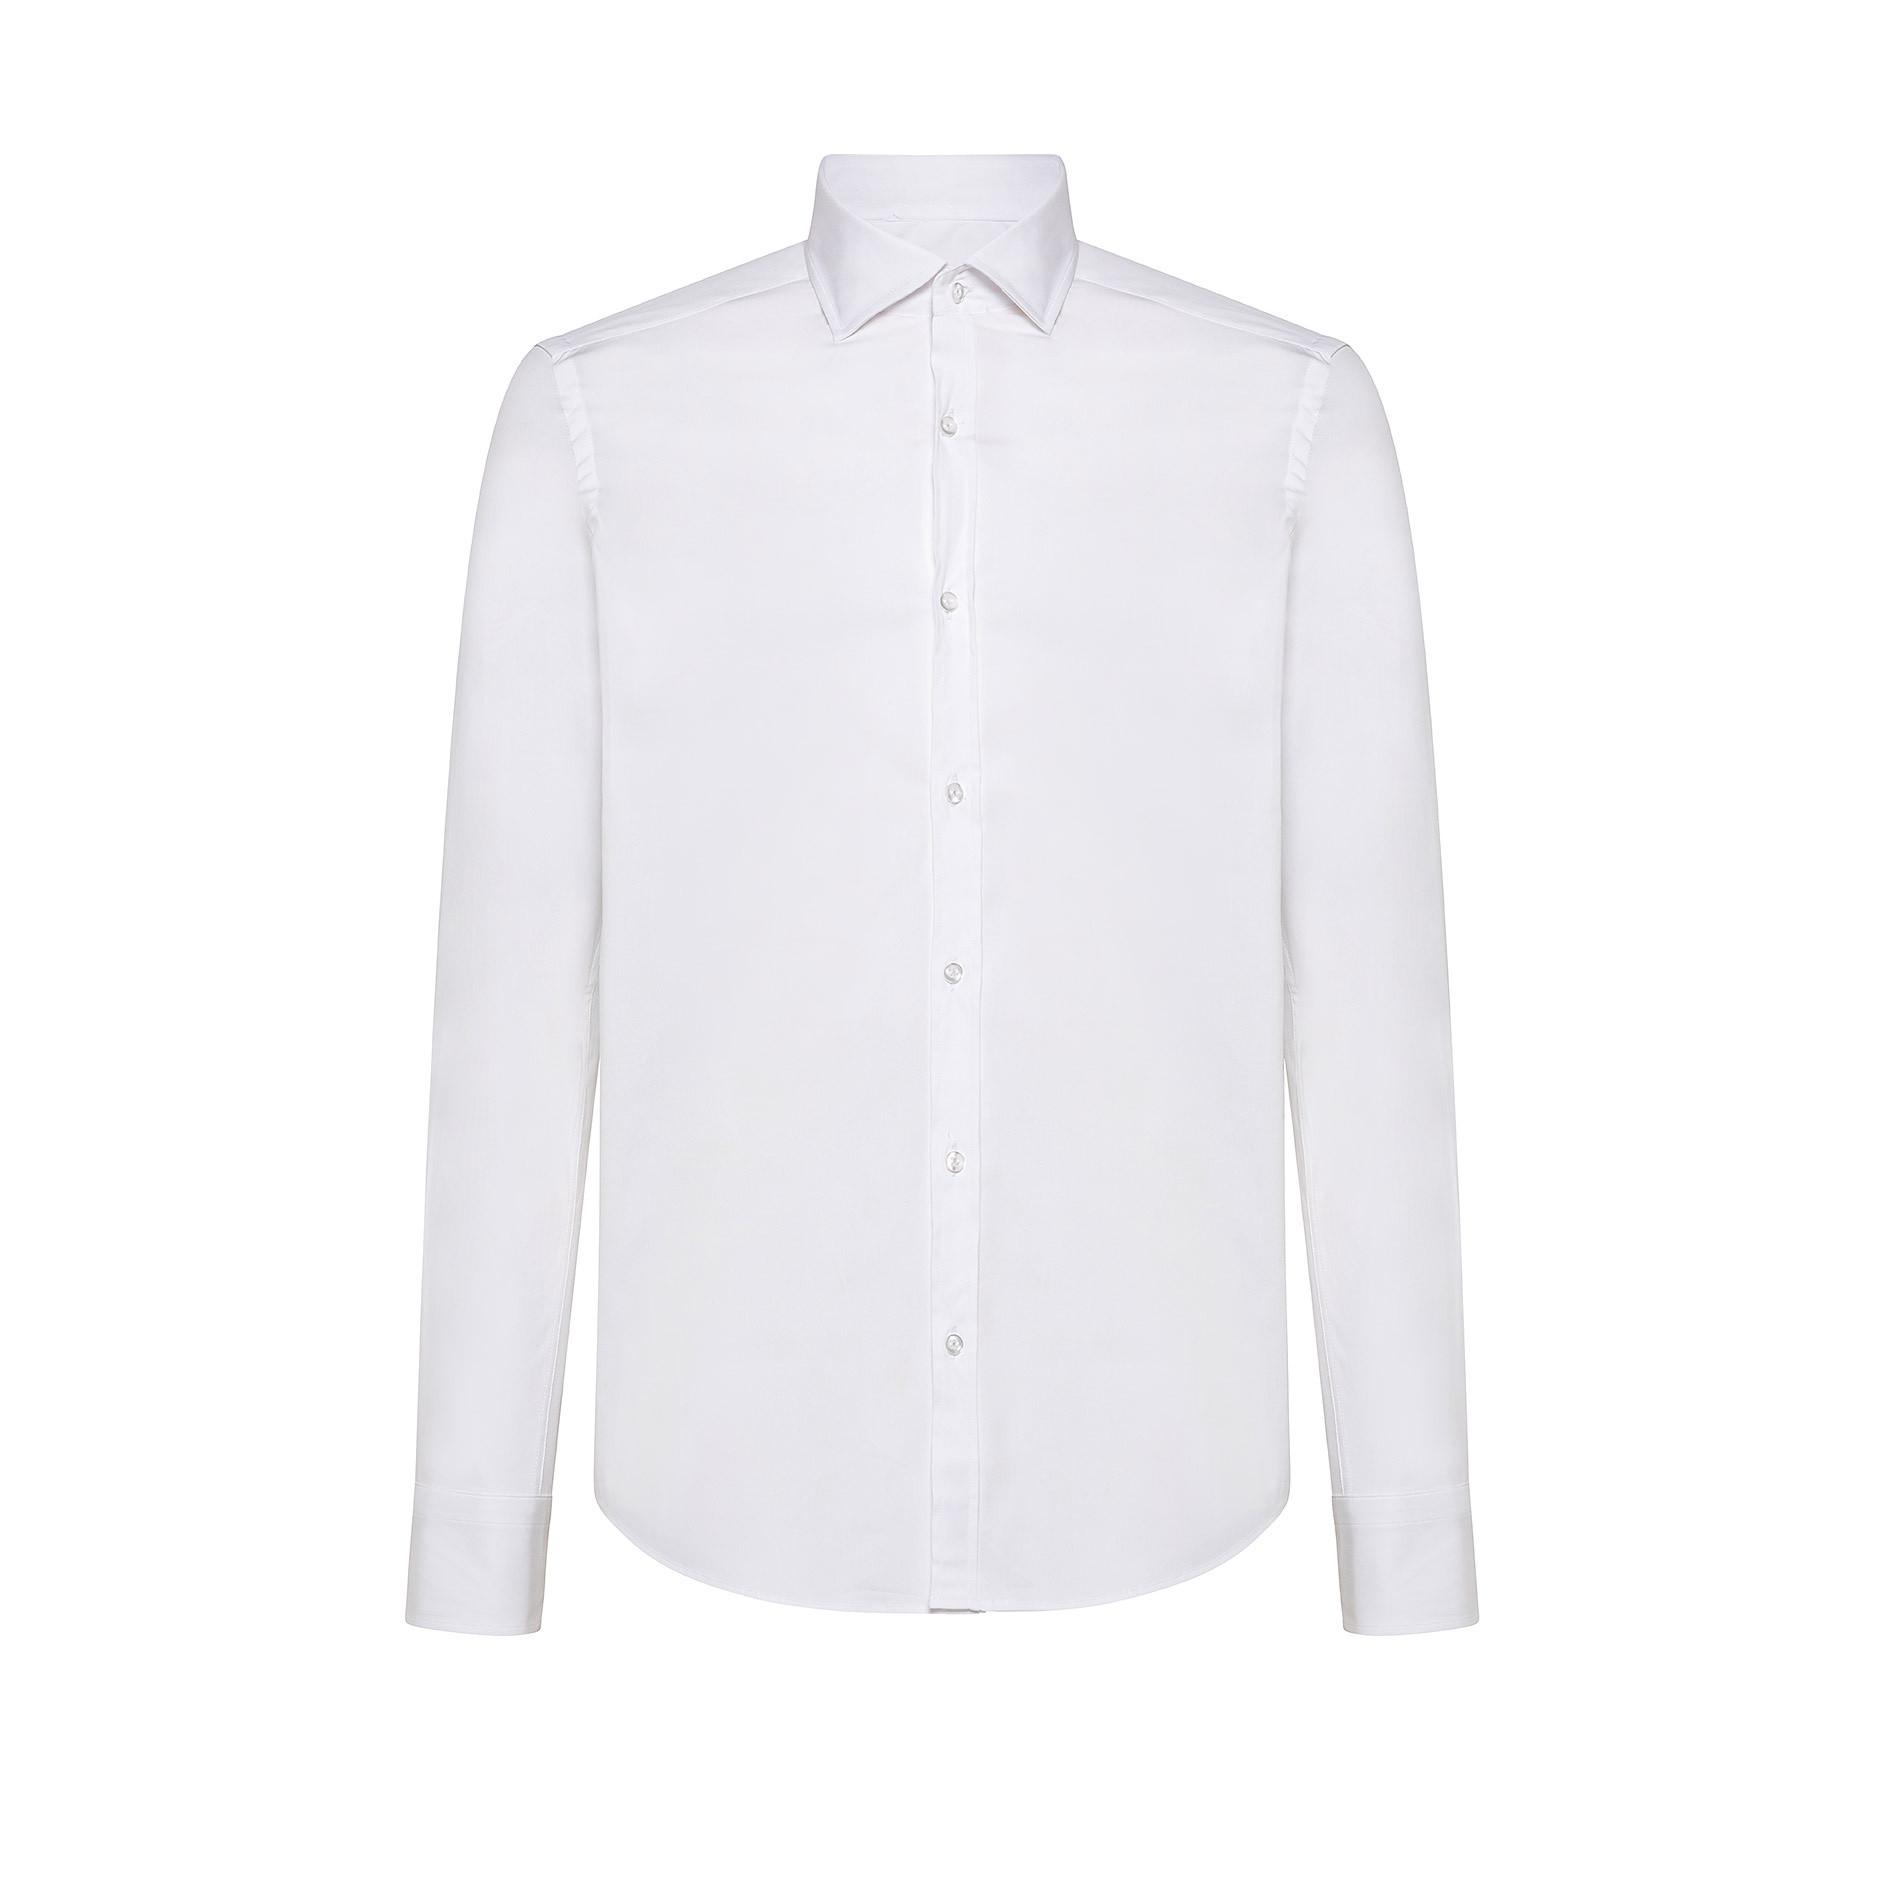 Camicia button-down popeline di cotone, Bianco, large image number 0